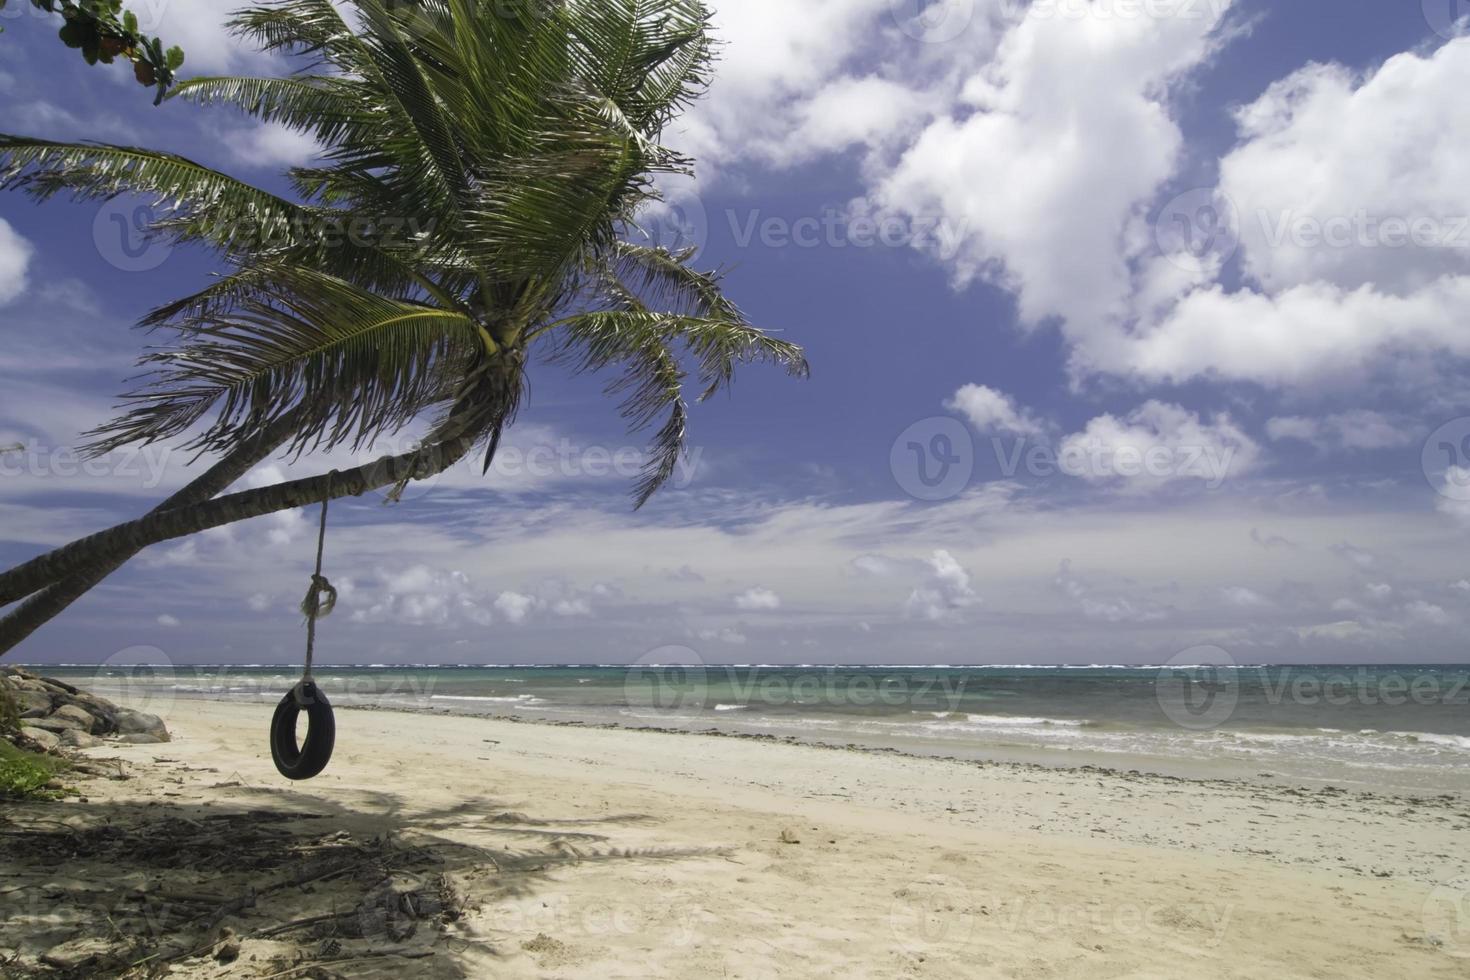 altalena pneumatico per spiaggia tropicale foto